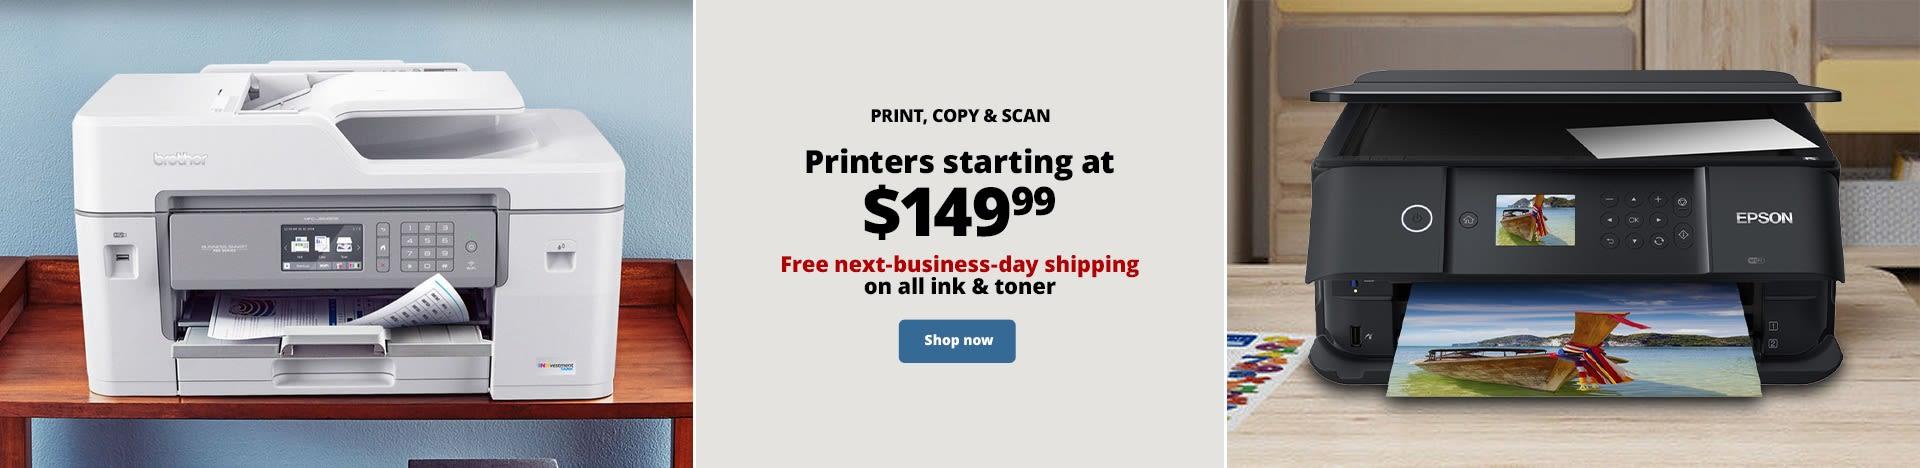 Printers starting at $149.99